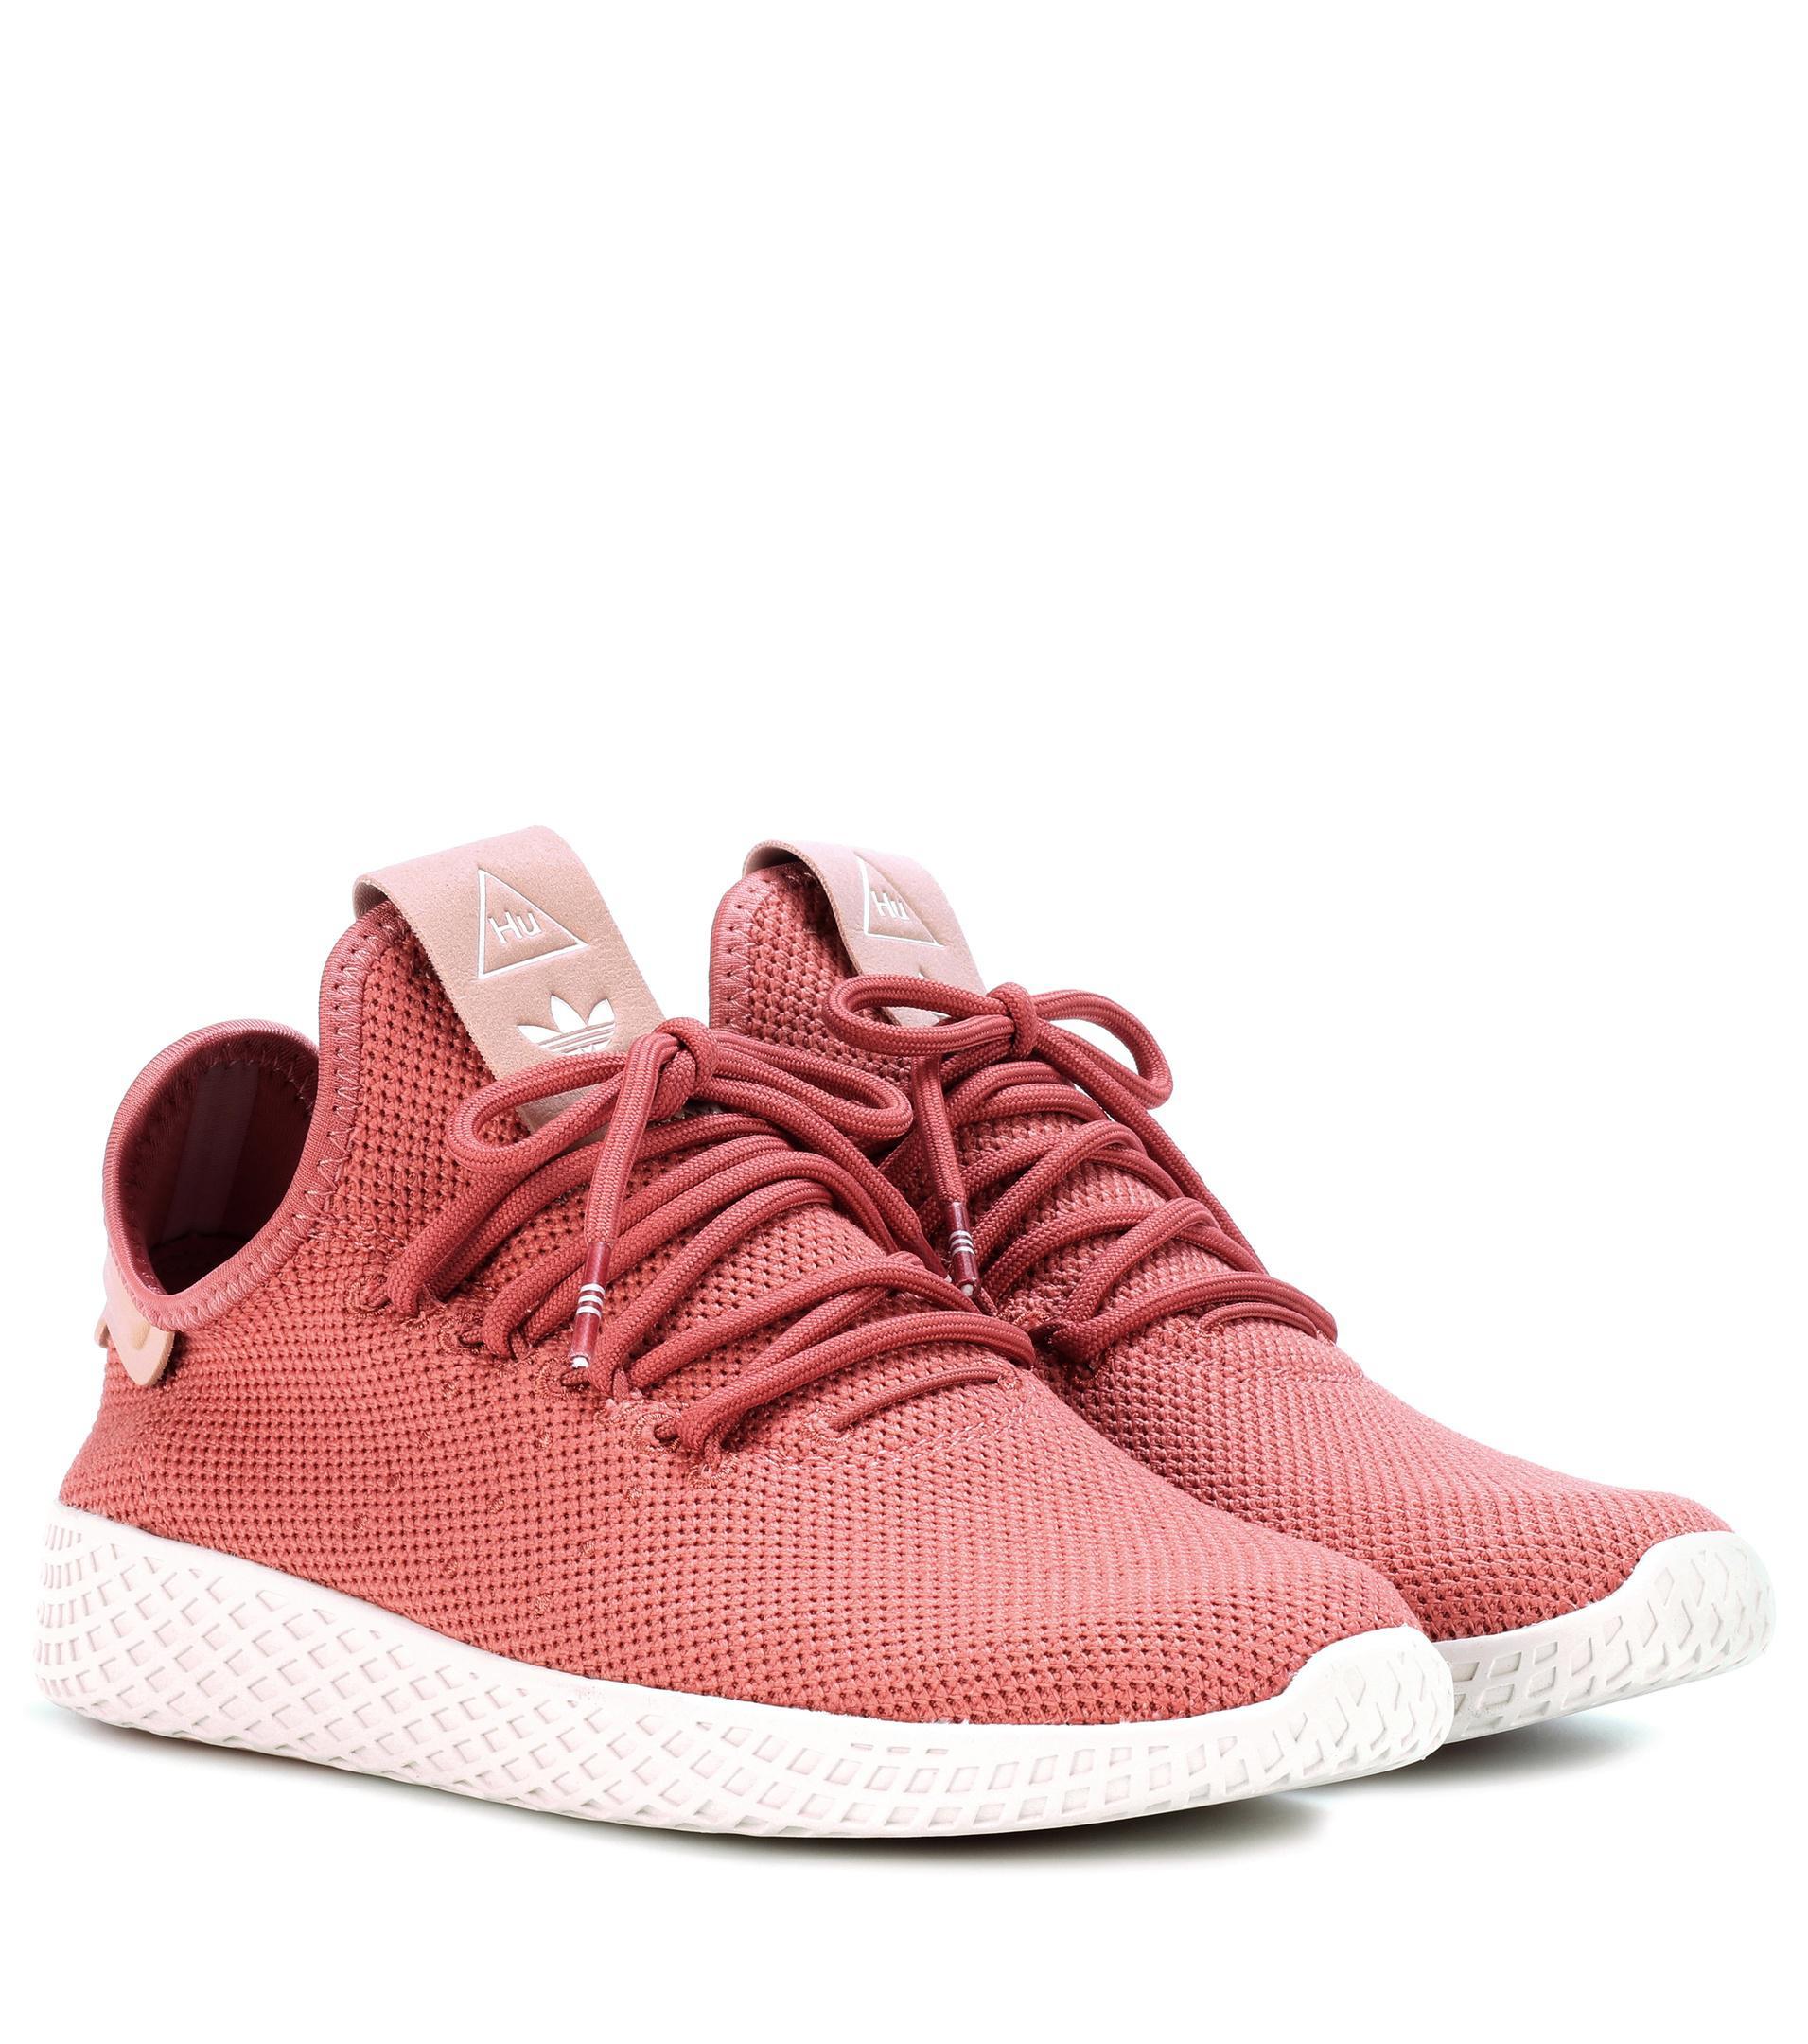 lyst adidas originali pharrell williams tennis hu scarpe rosa